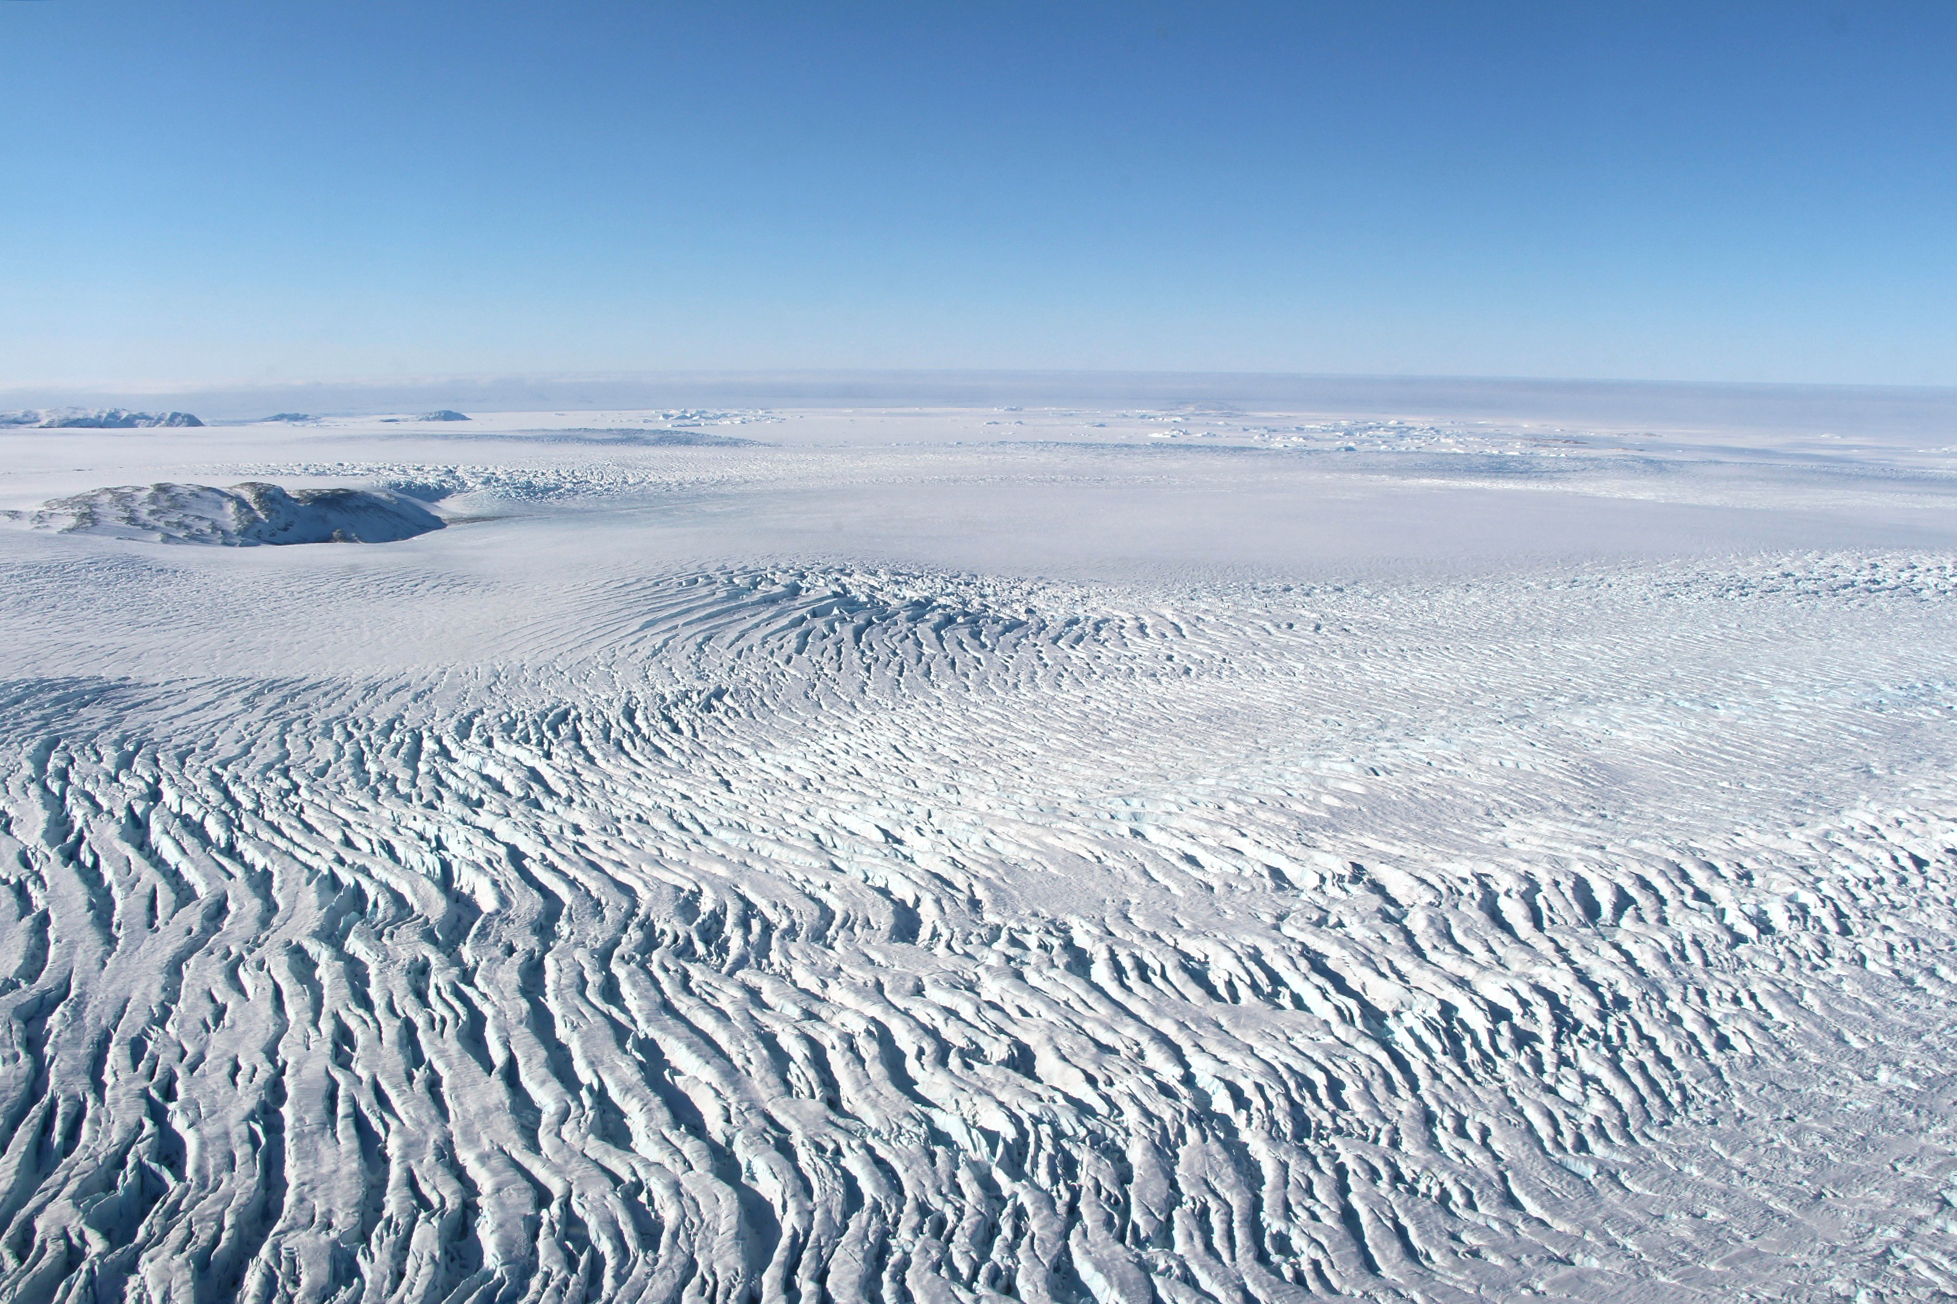 The Scandinavian glacier covered all of Finland. Image: GlacierHub, NASA.